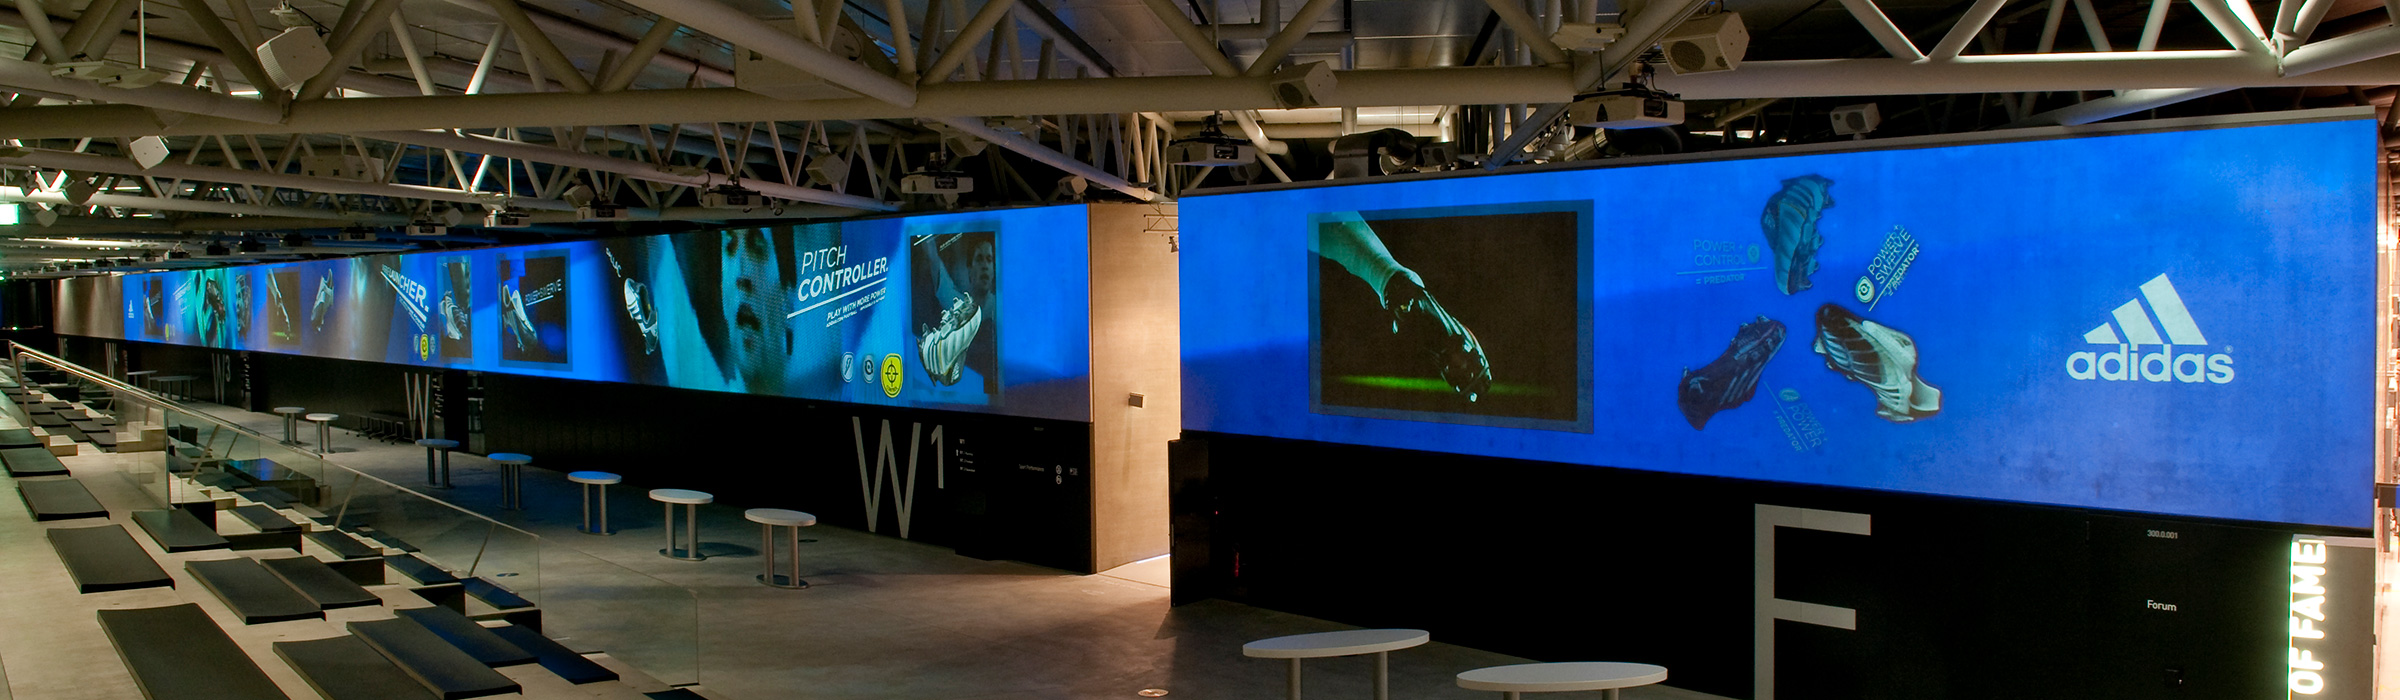 Referenz 105m Projektion im aCC Firma adidas